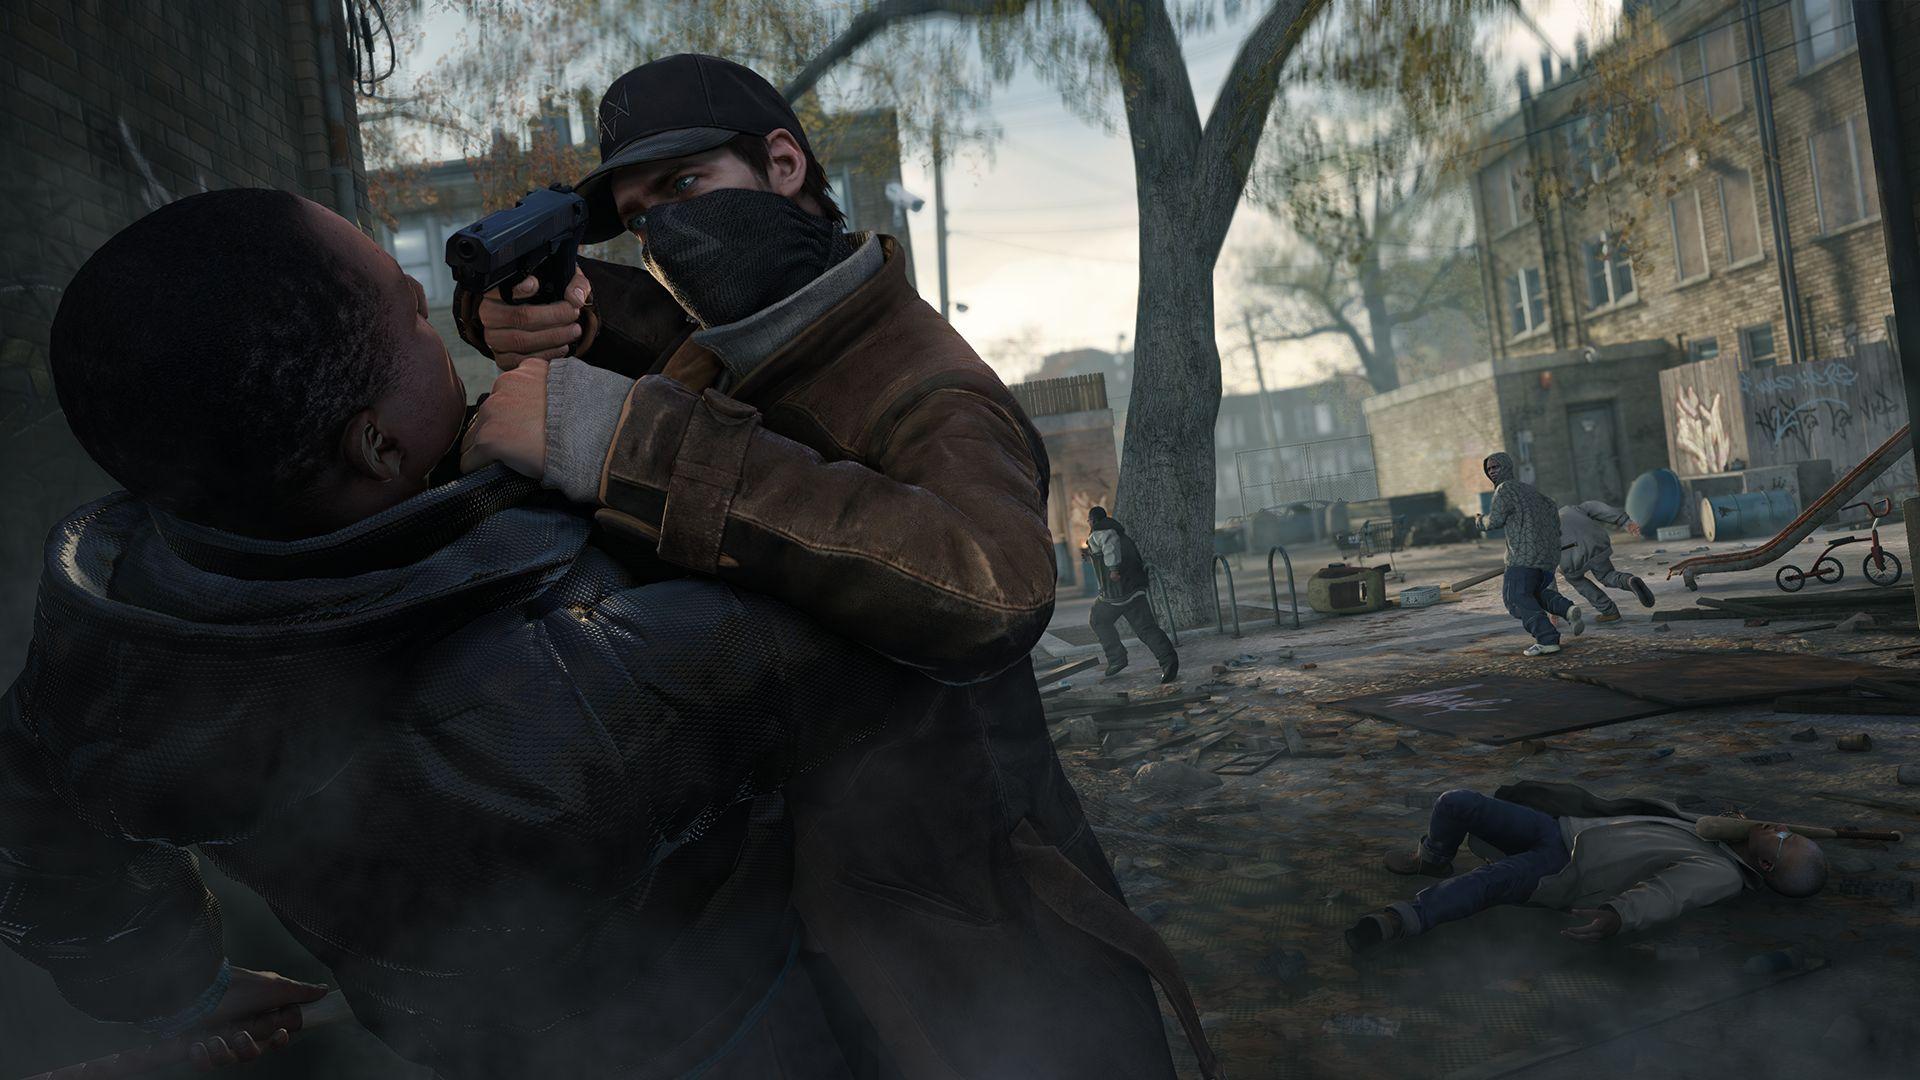 Watch_Dogs (Xbox One) - 10